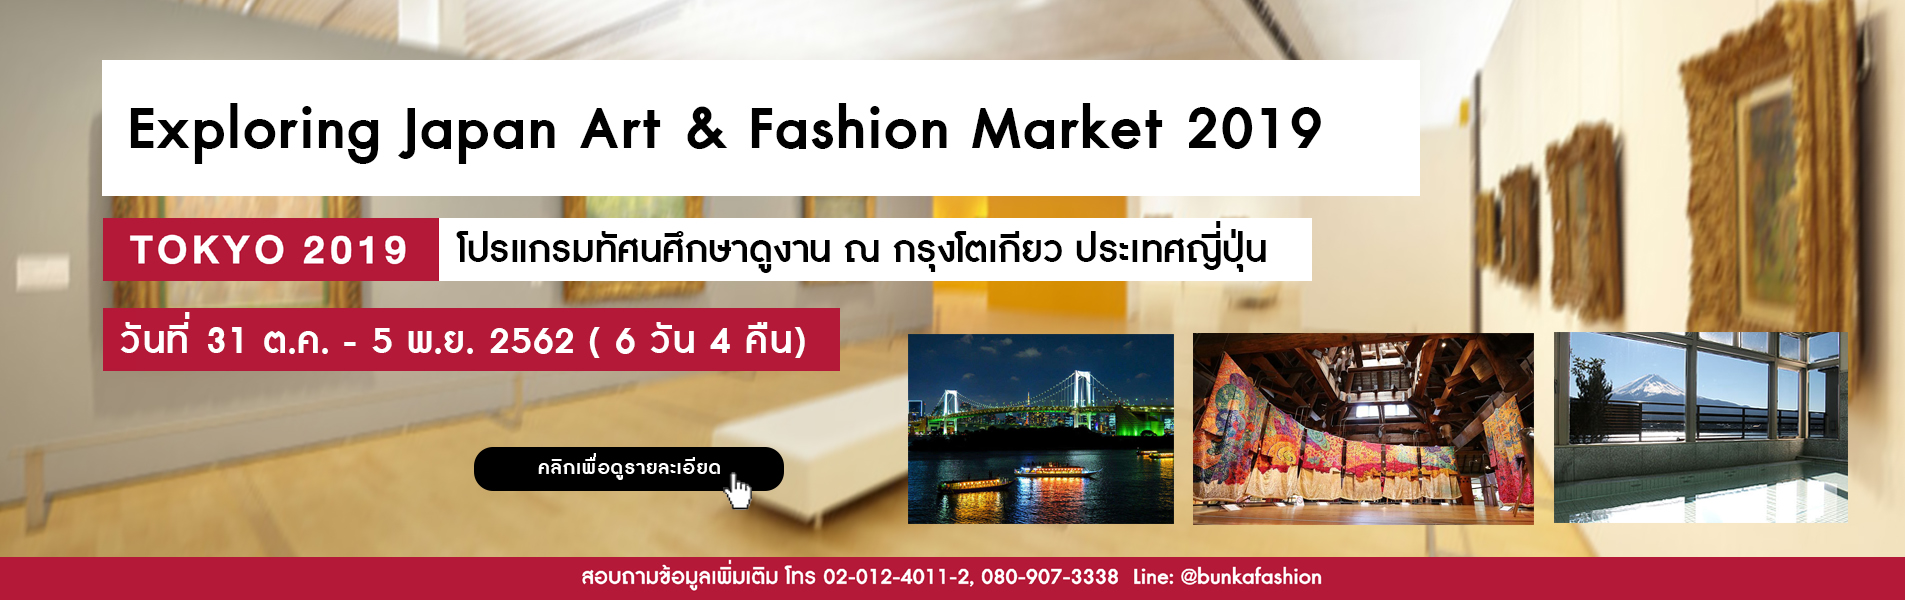 bunka exploring japan art and fashion market 2019